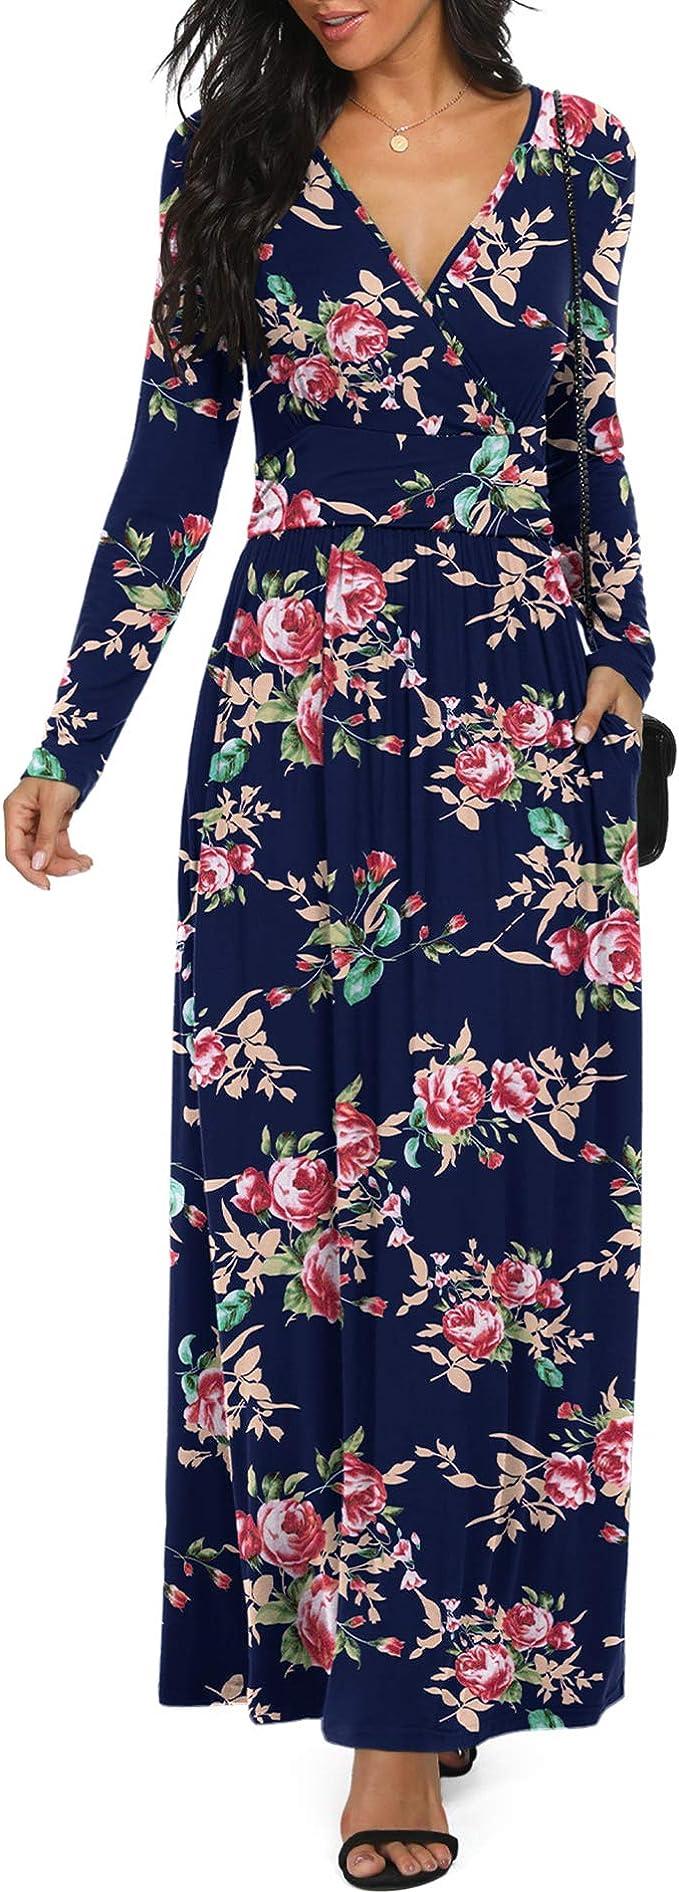 Women's Pretty Dresses for Date Night, Long Sleeve V Neck Long Floral Dresses